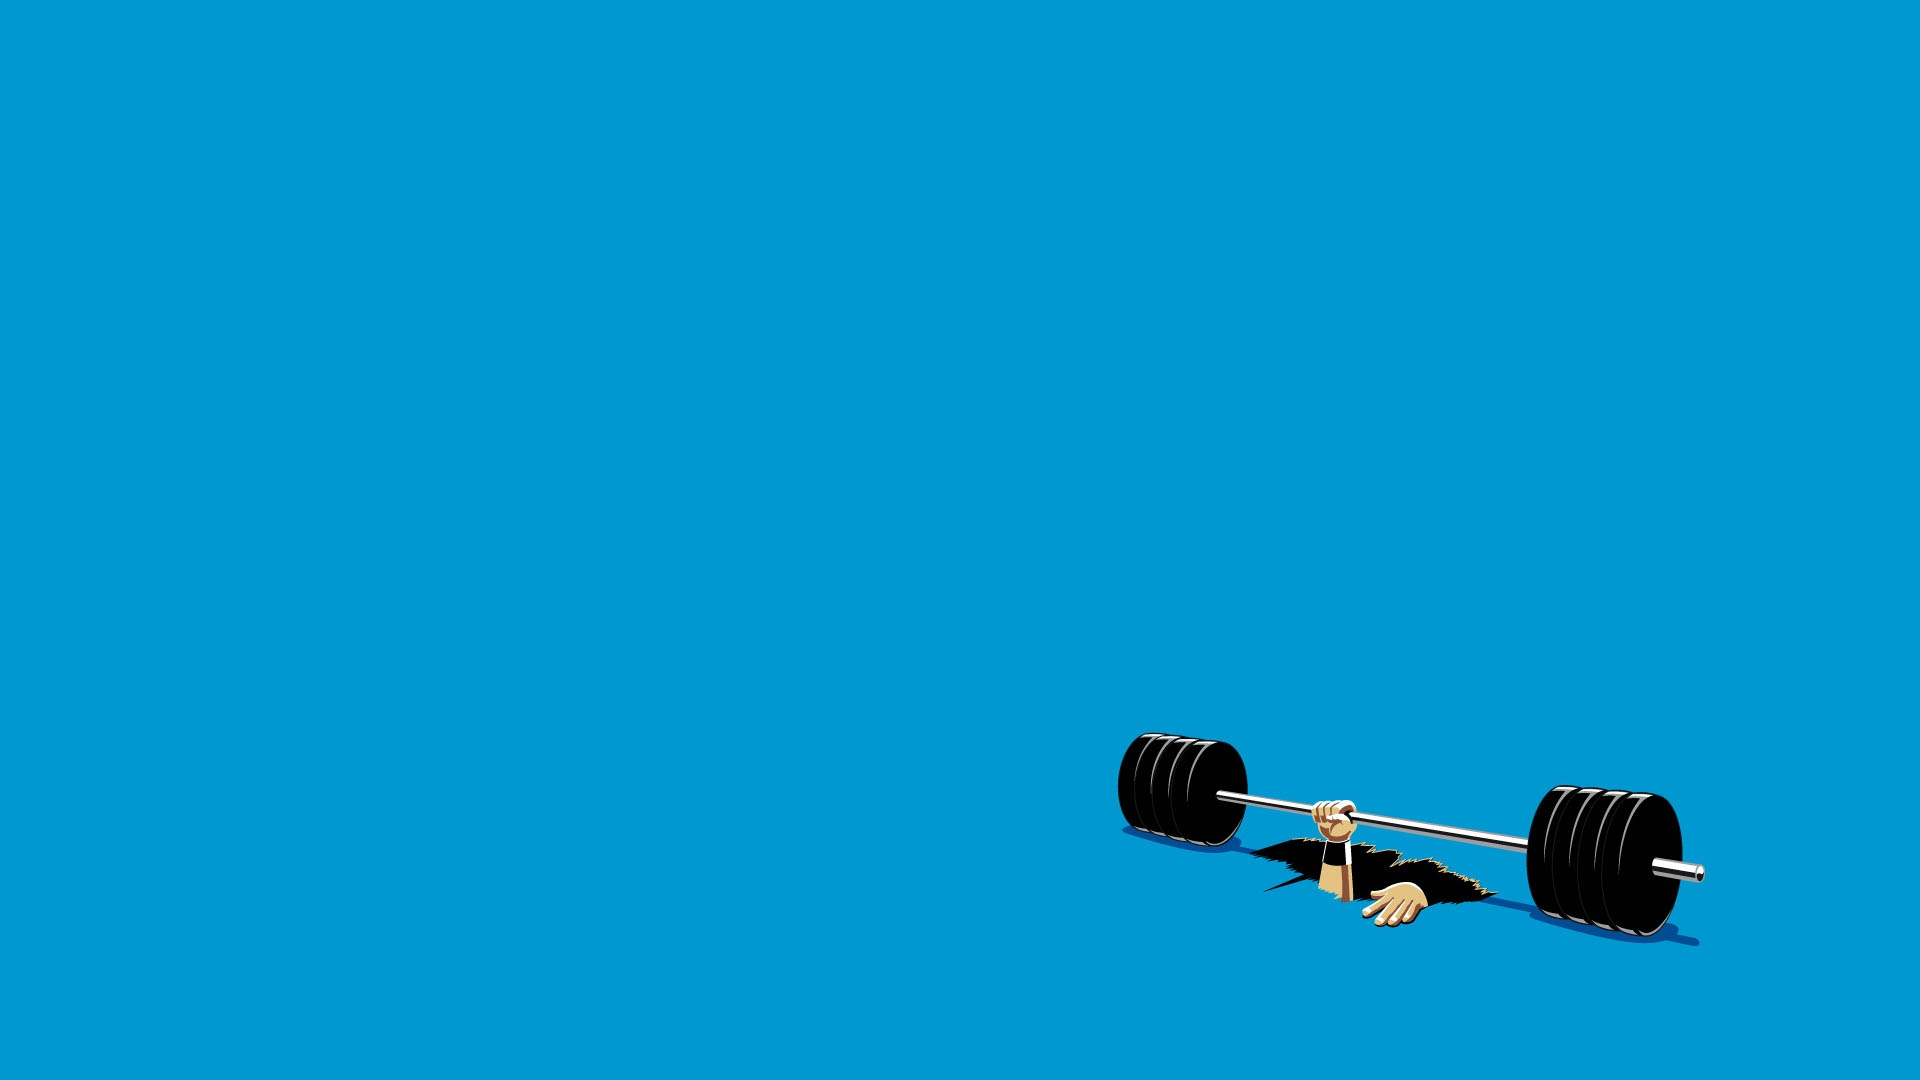 training motivation iphone wallpaper